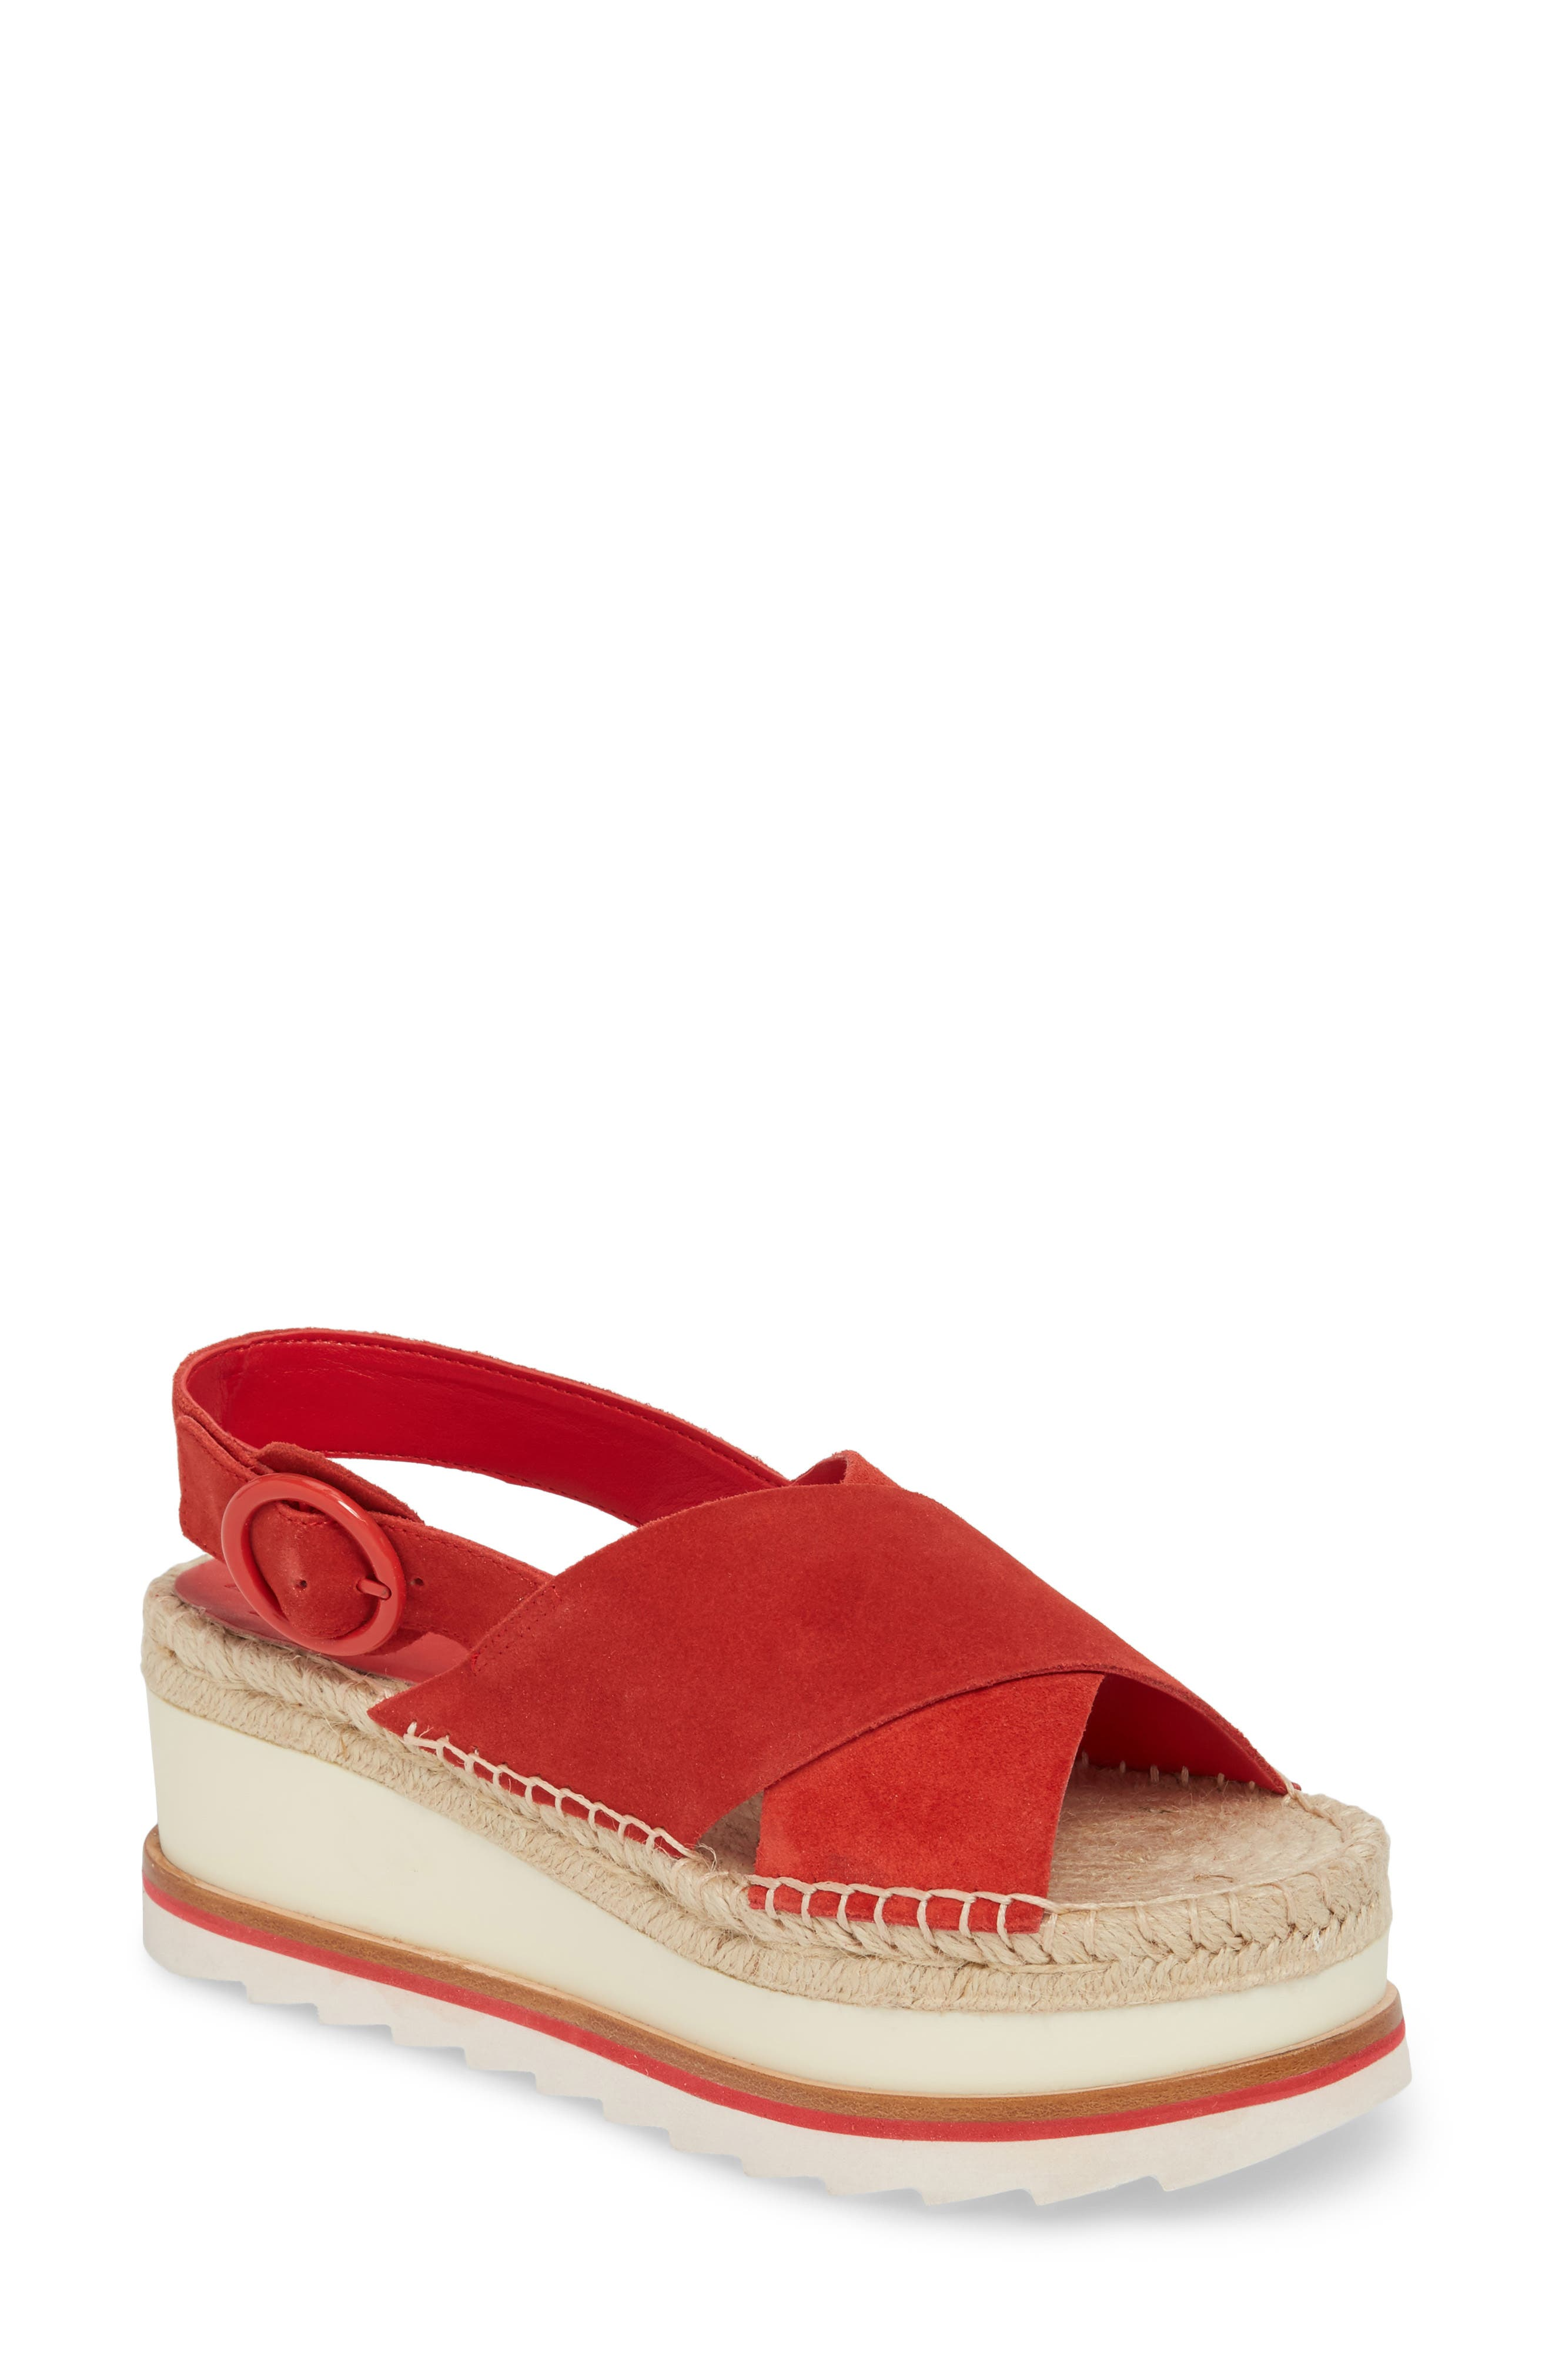 Glenna Platform Slingback Sandal,                             Main thumbnail 4, color,